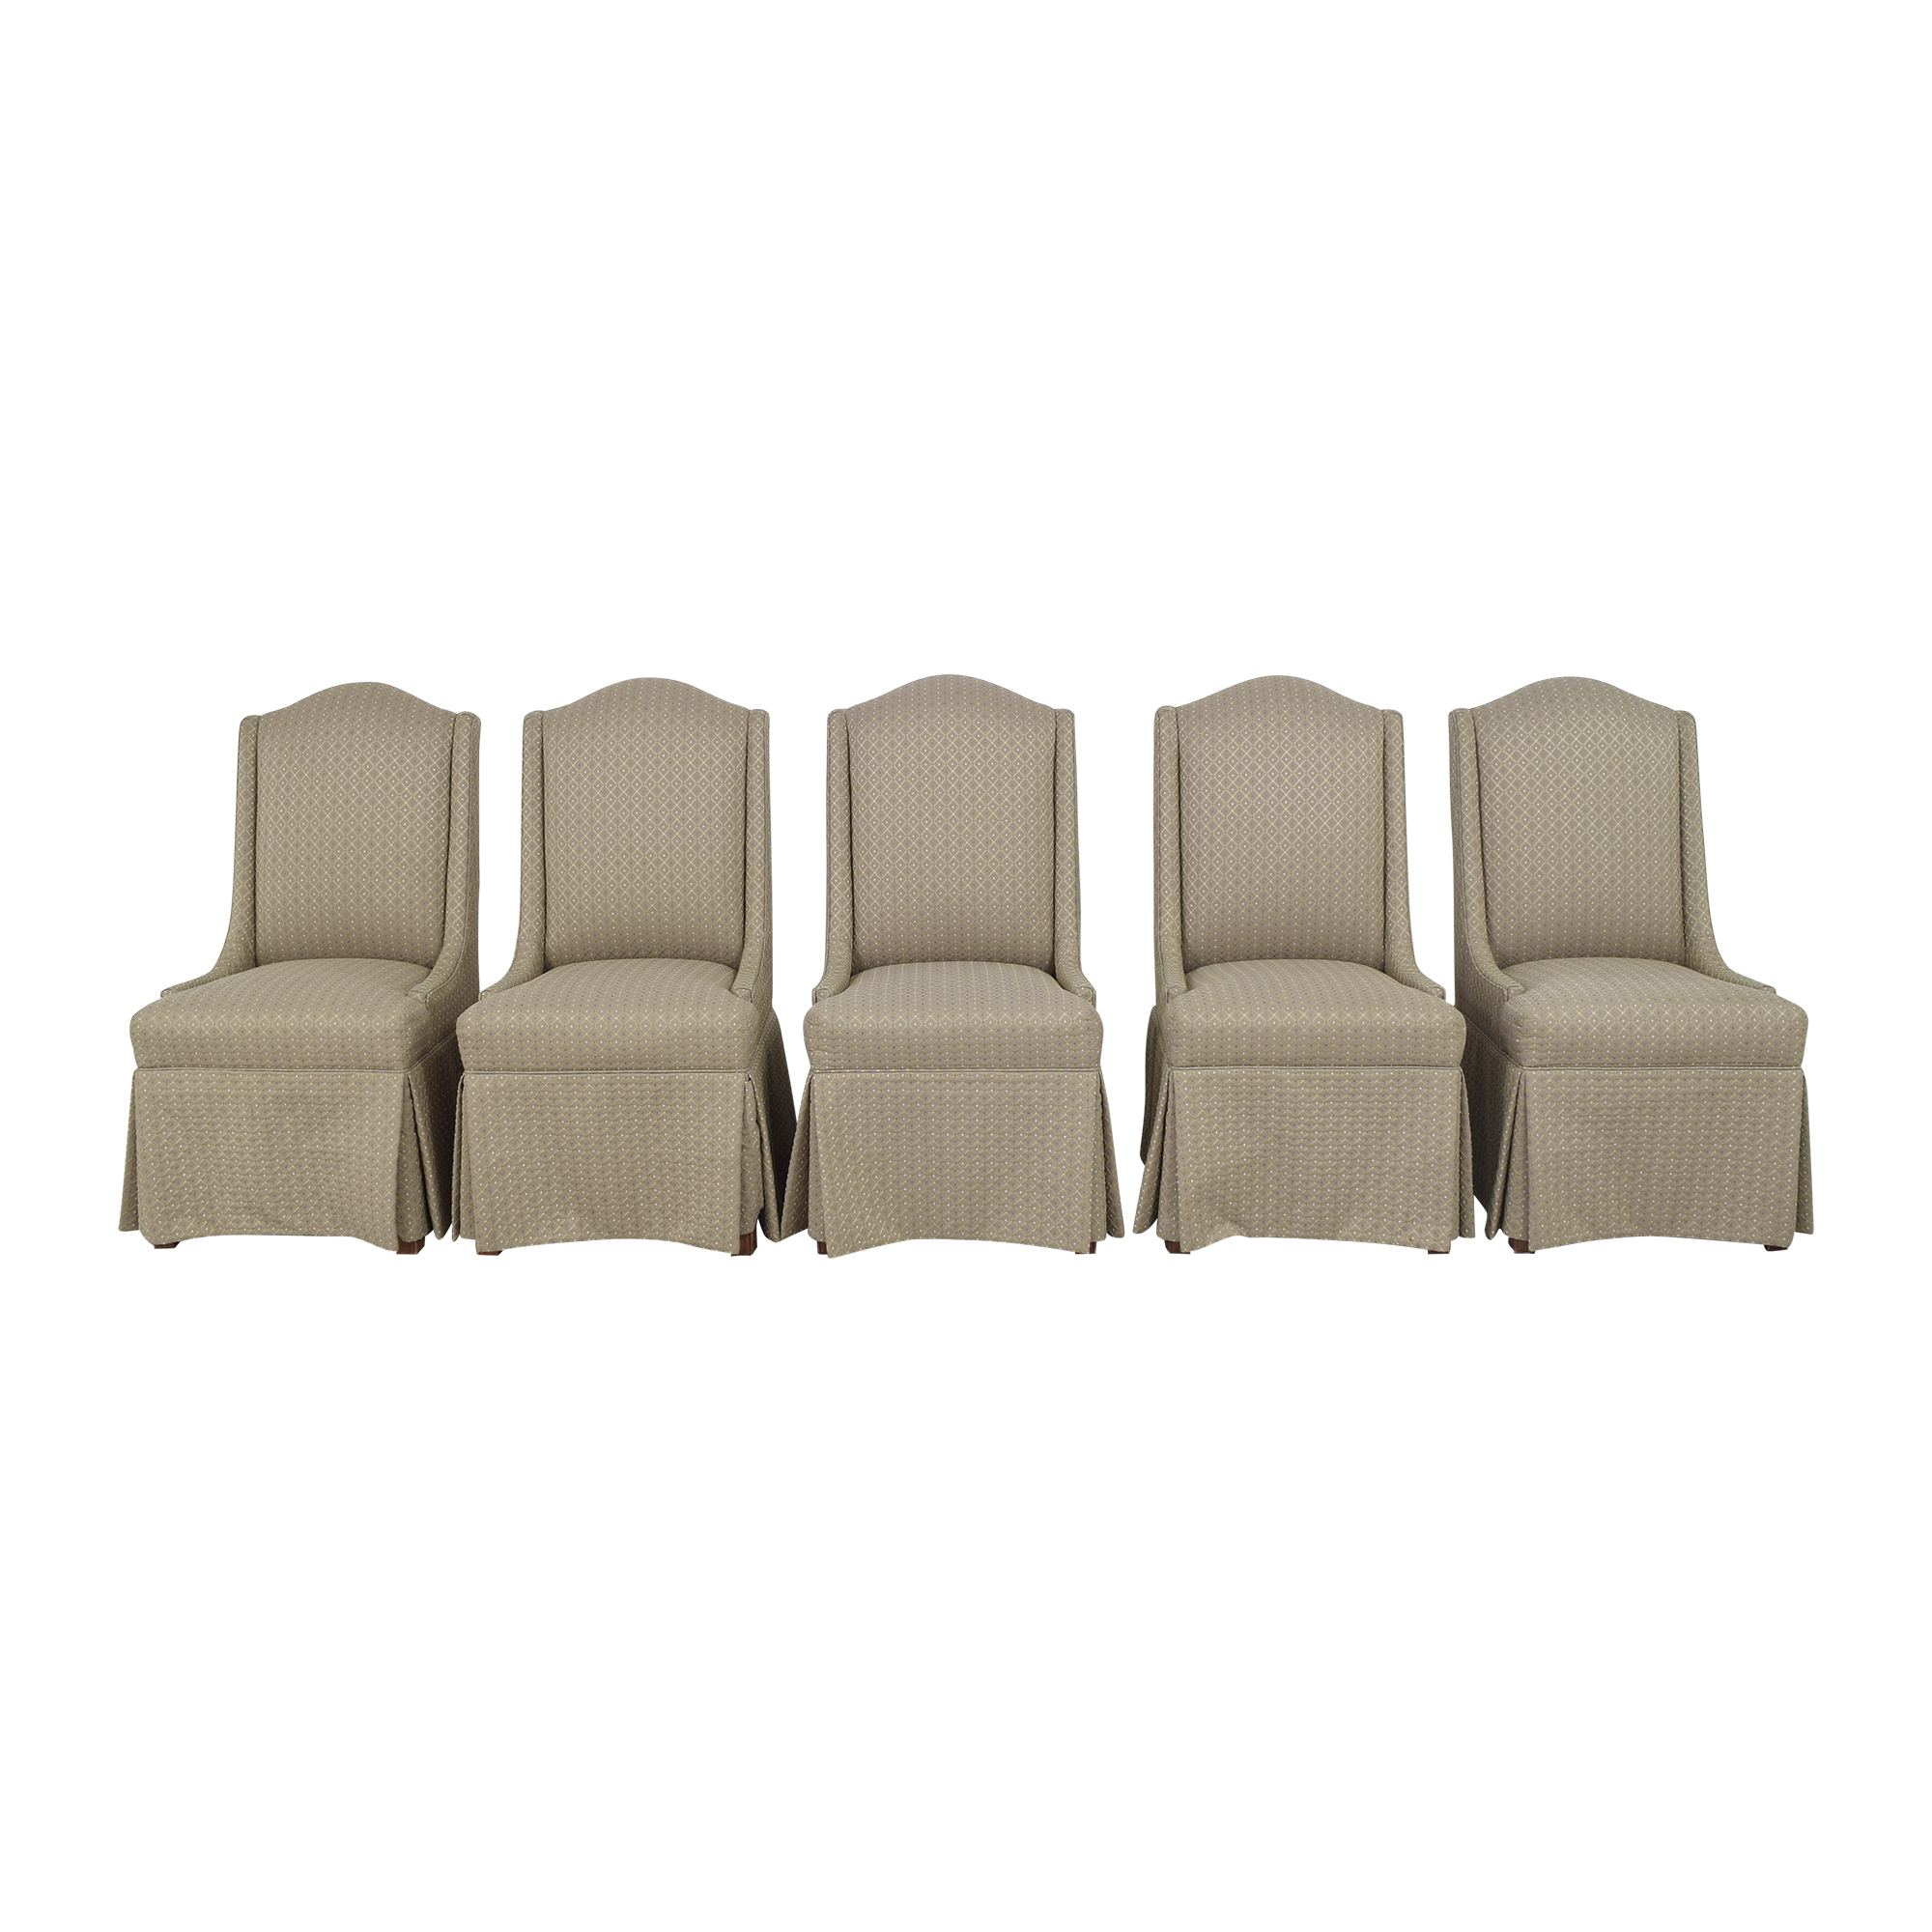 buy Pennsylvania House Skirted Dining Chairs Pennsylvania House Chairs